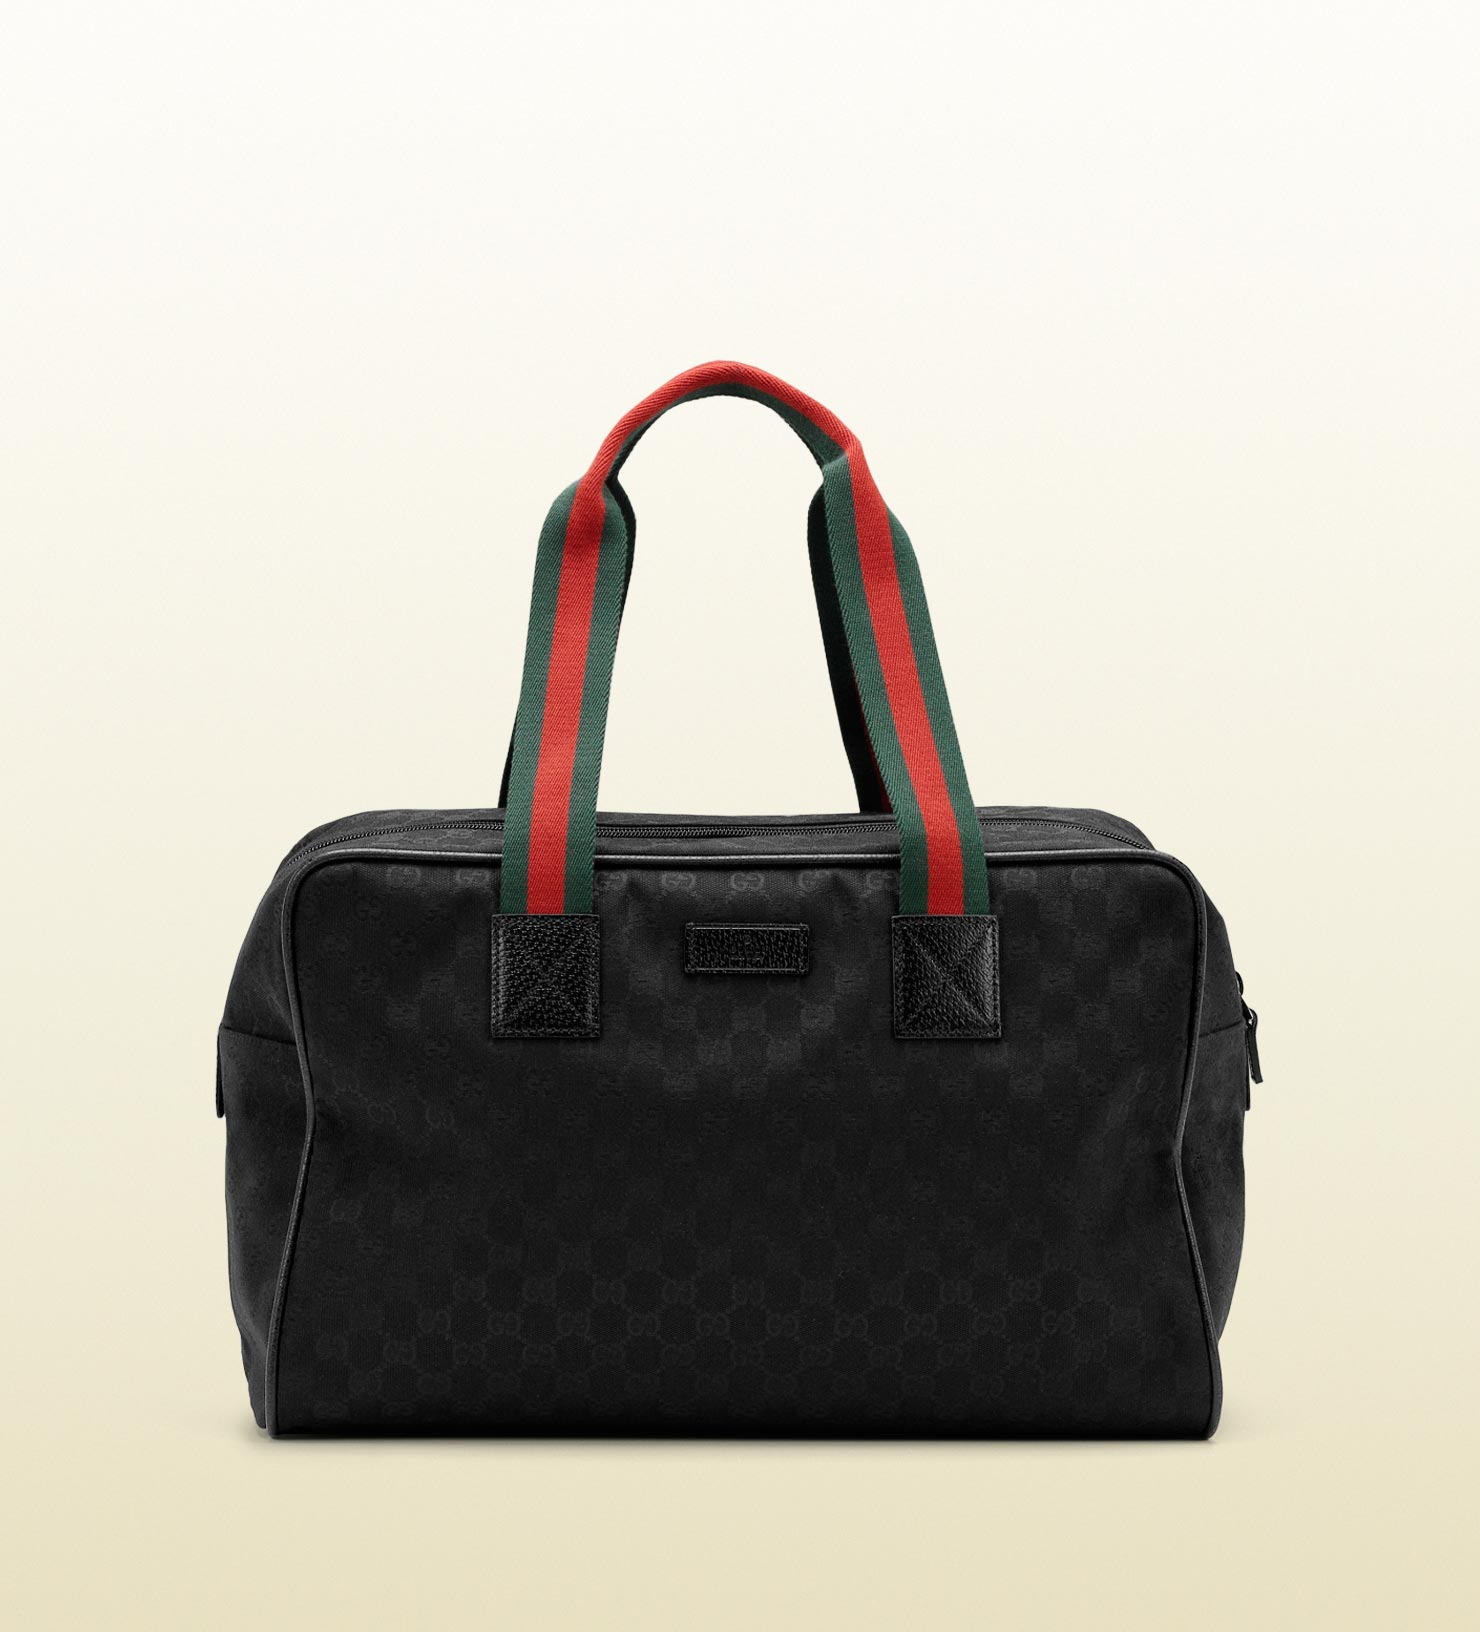 Gucci Original Gg Canvas Carry-on Duffle Bag in Black for Men - Lyst e2b883a63cf7e